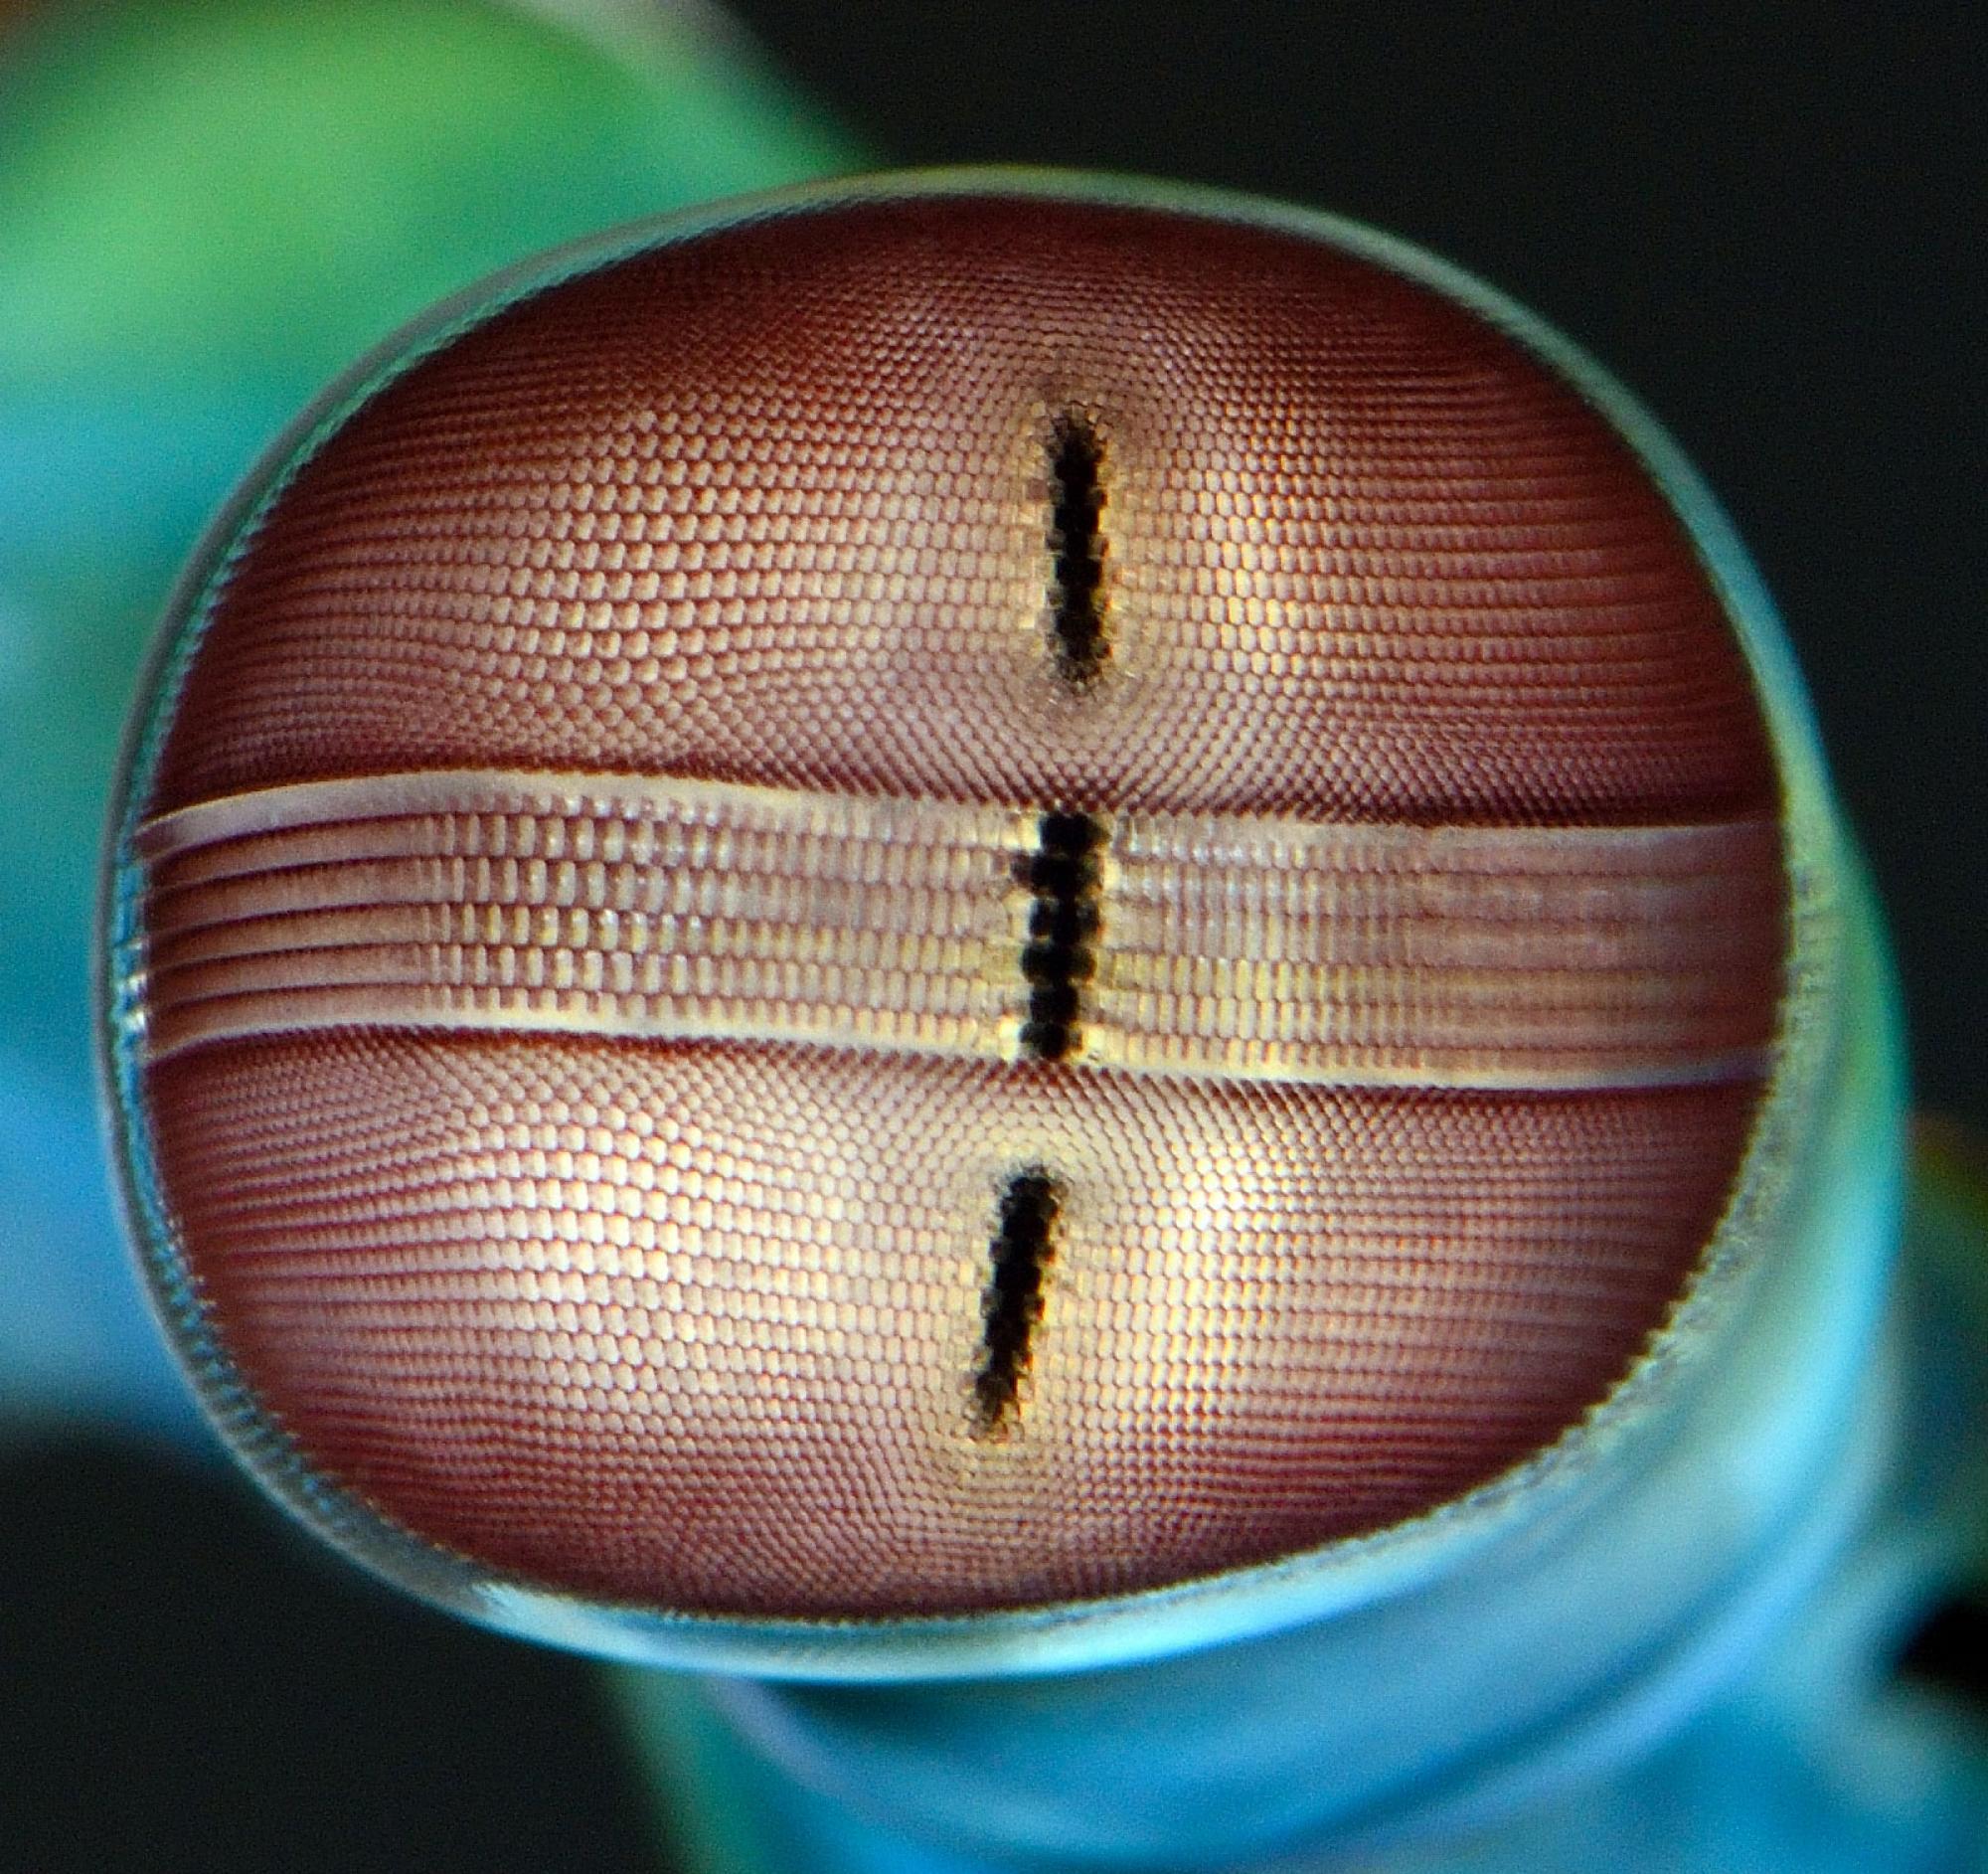 A close-up of the unique architecture of the mantis shrimp eye.